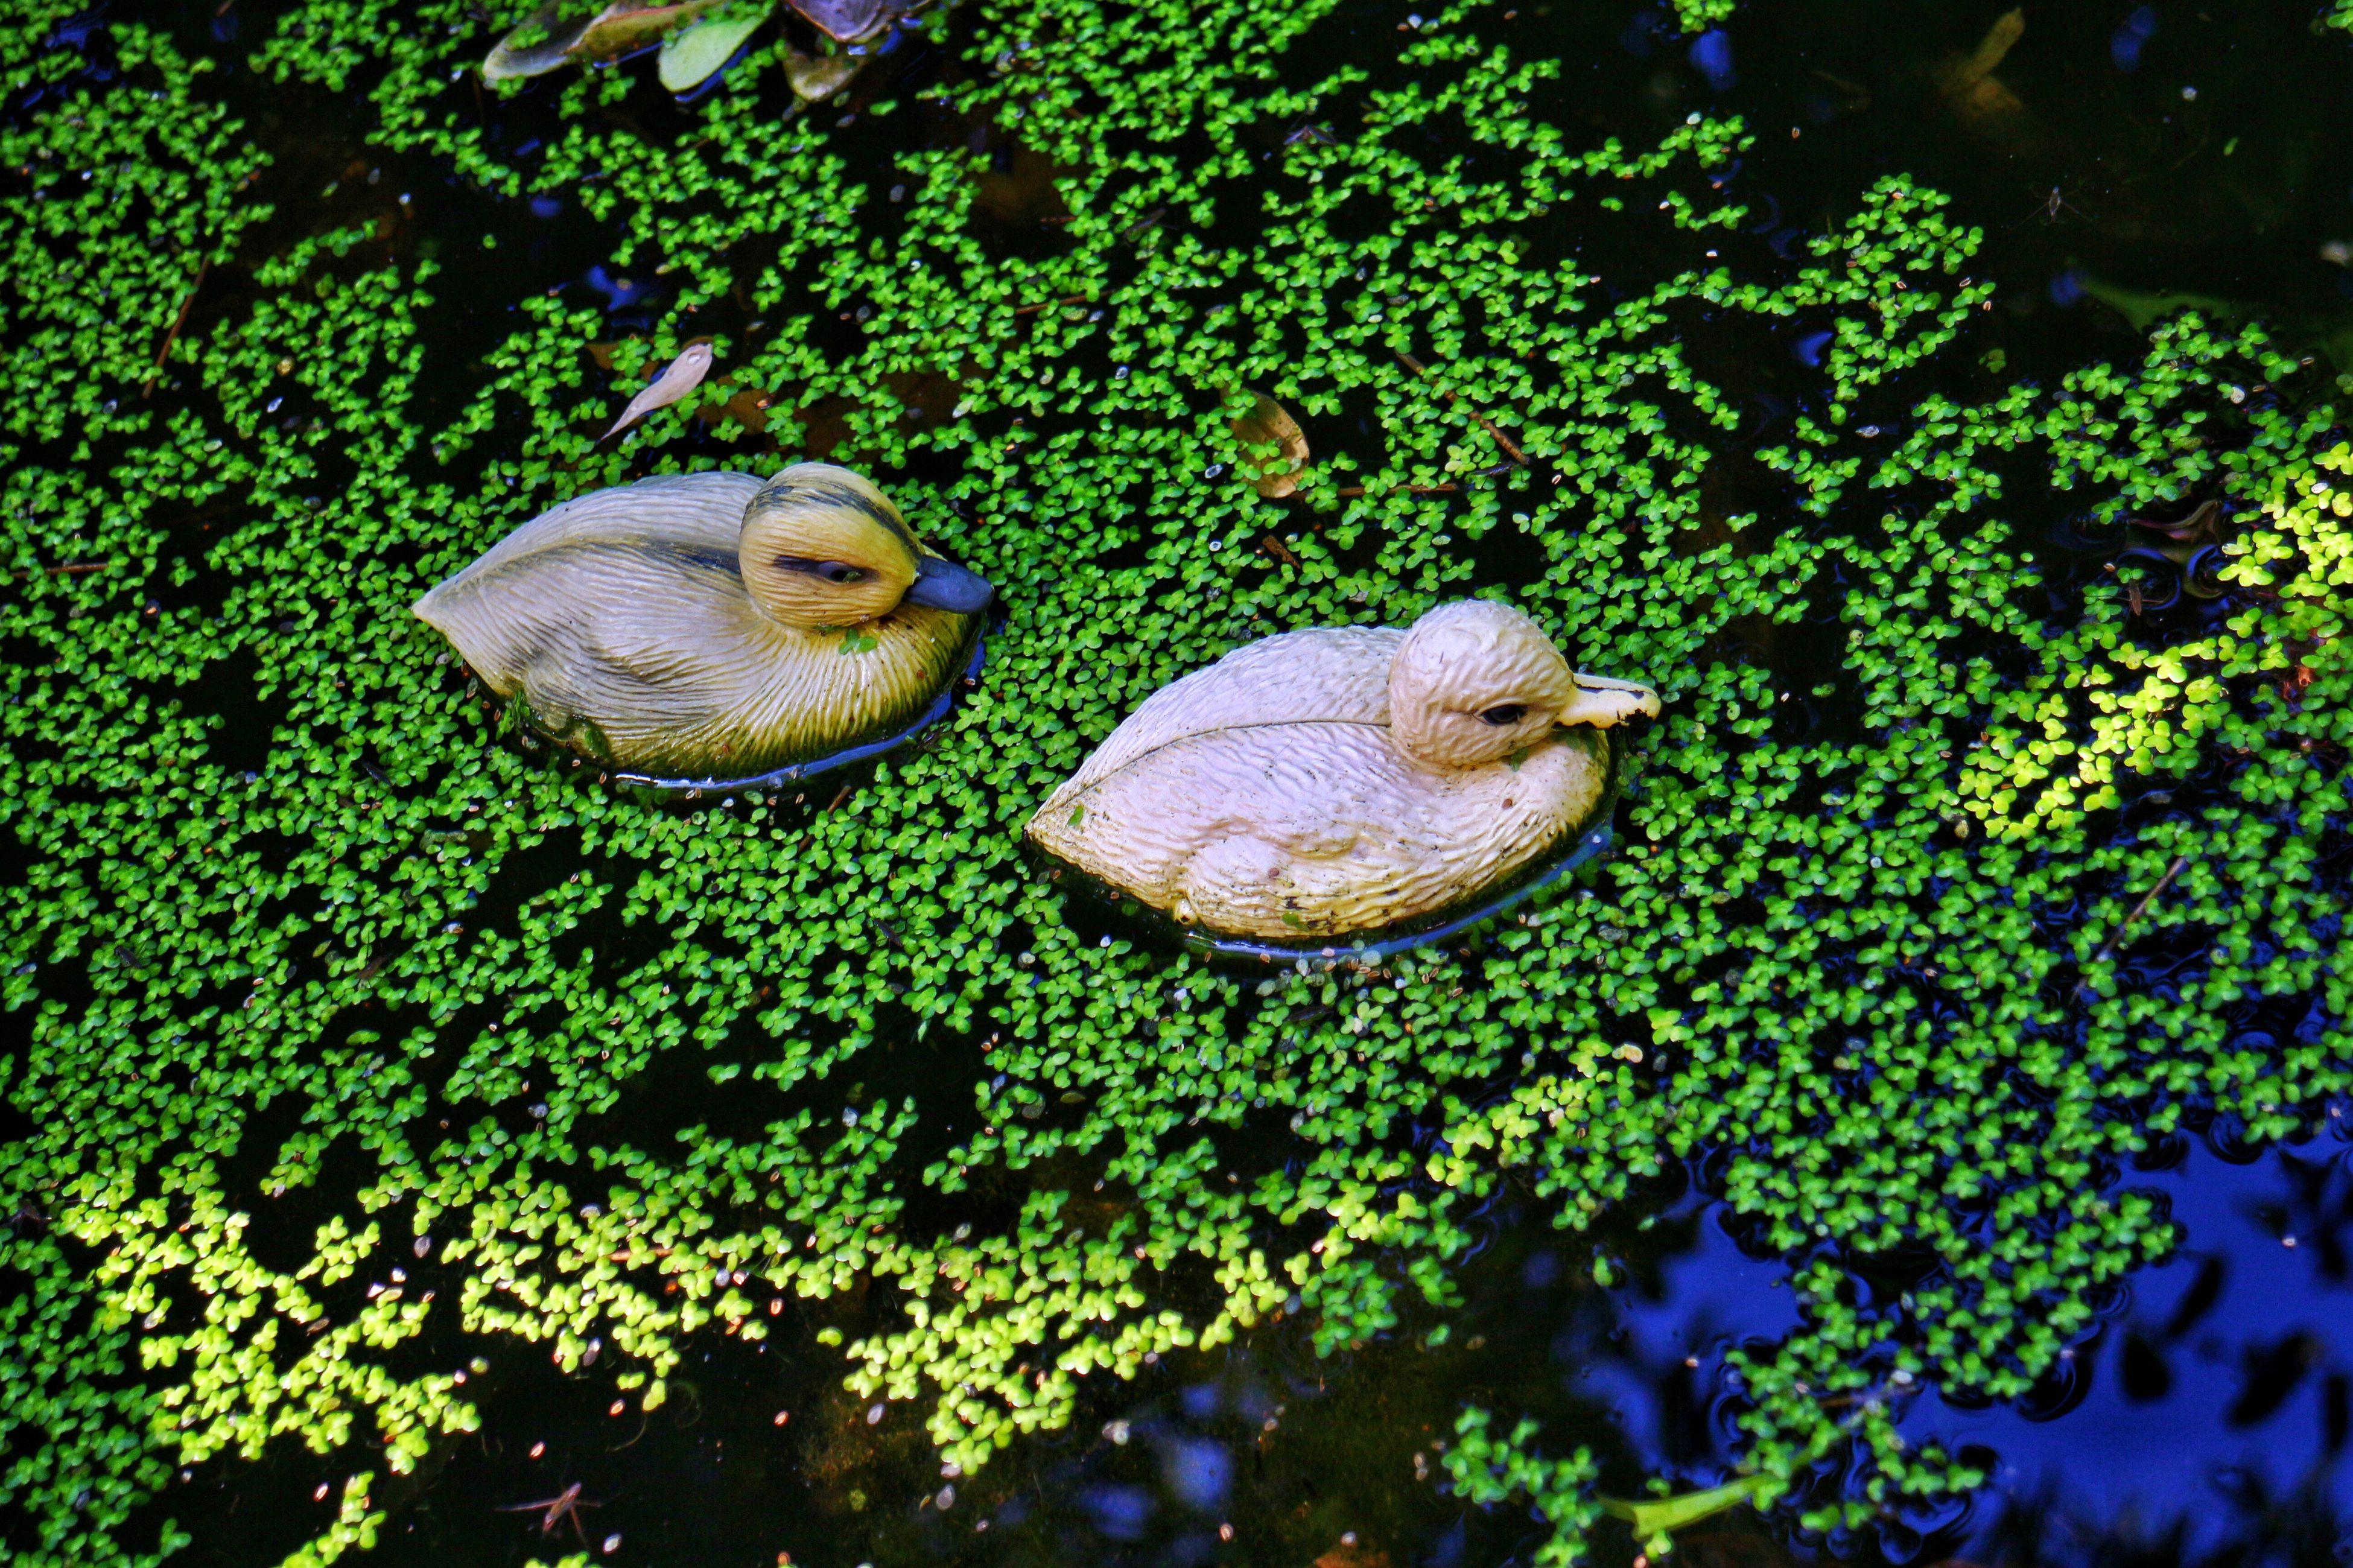 Ducklings Rubber Ducklings Rubber Duckies Duckies Lures Fresh On Eyeem  Pond Duckweed Relaxed Scene Relaxing Scene Funny Hunting Lure